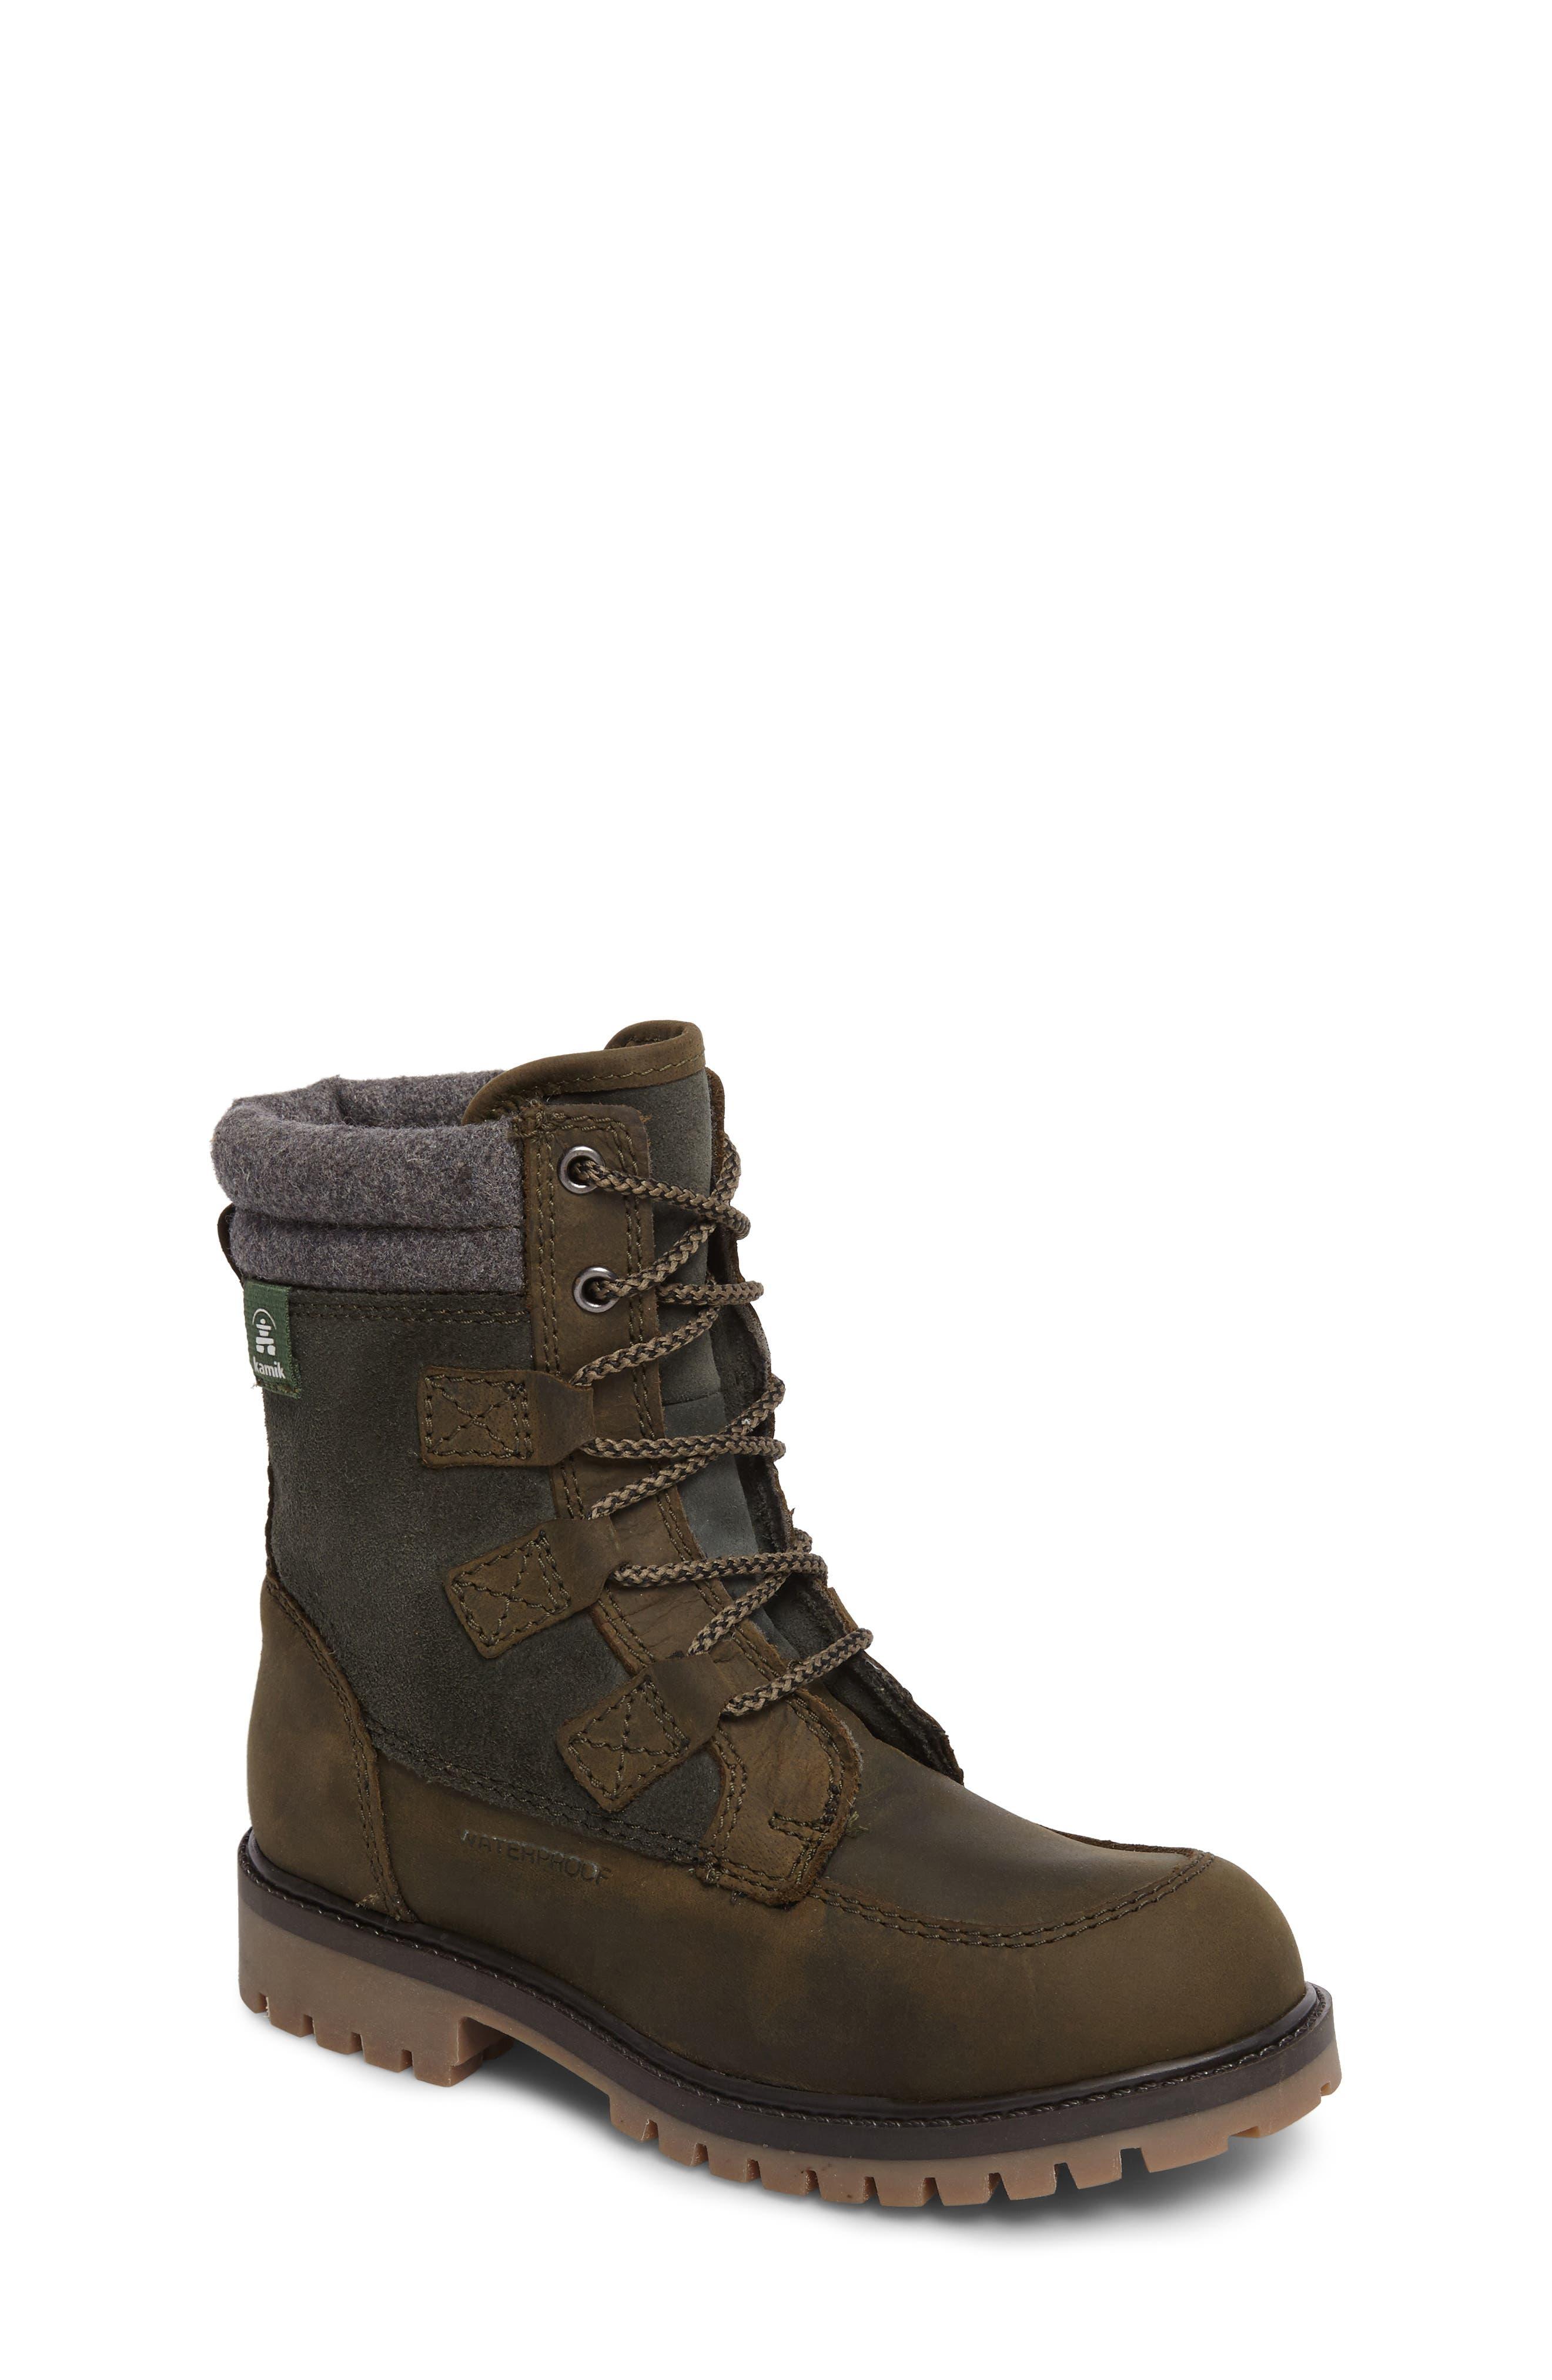 Takodalo Waterproof Boot,                             Main thumbnail 1, color,                             Olive